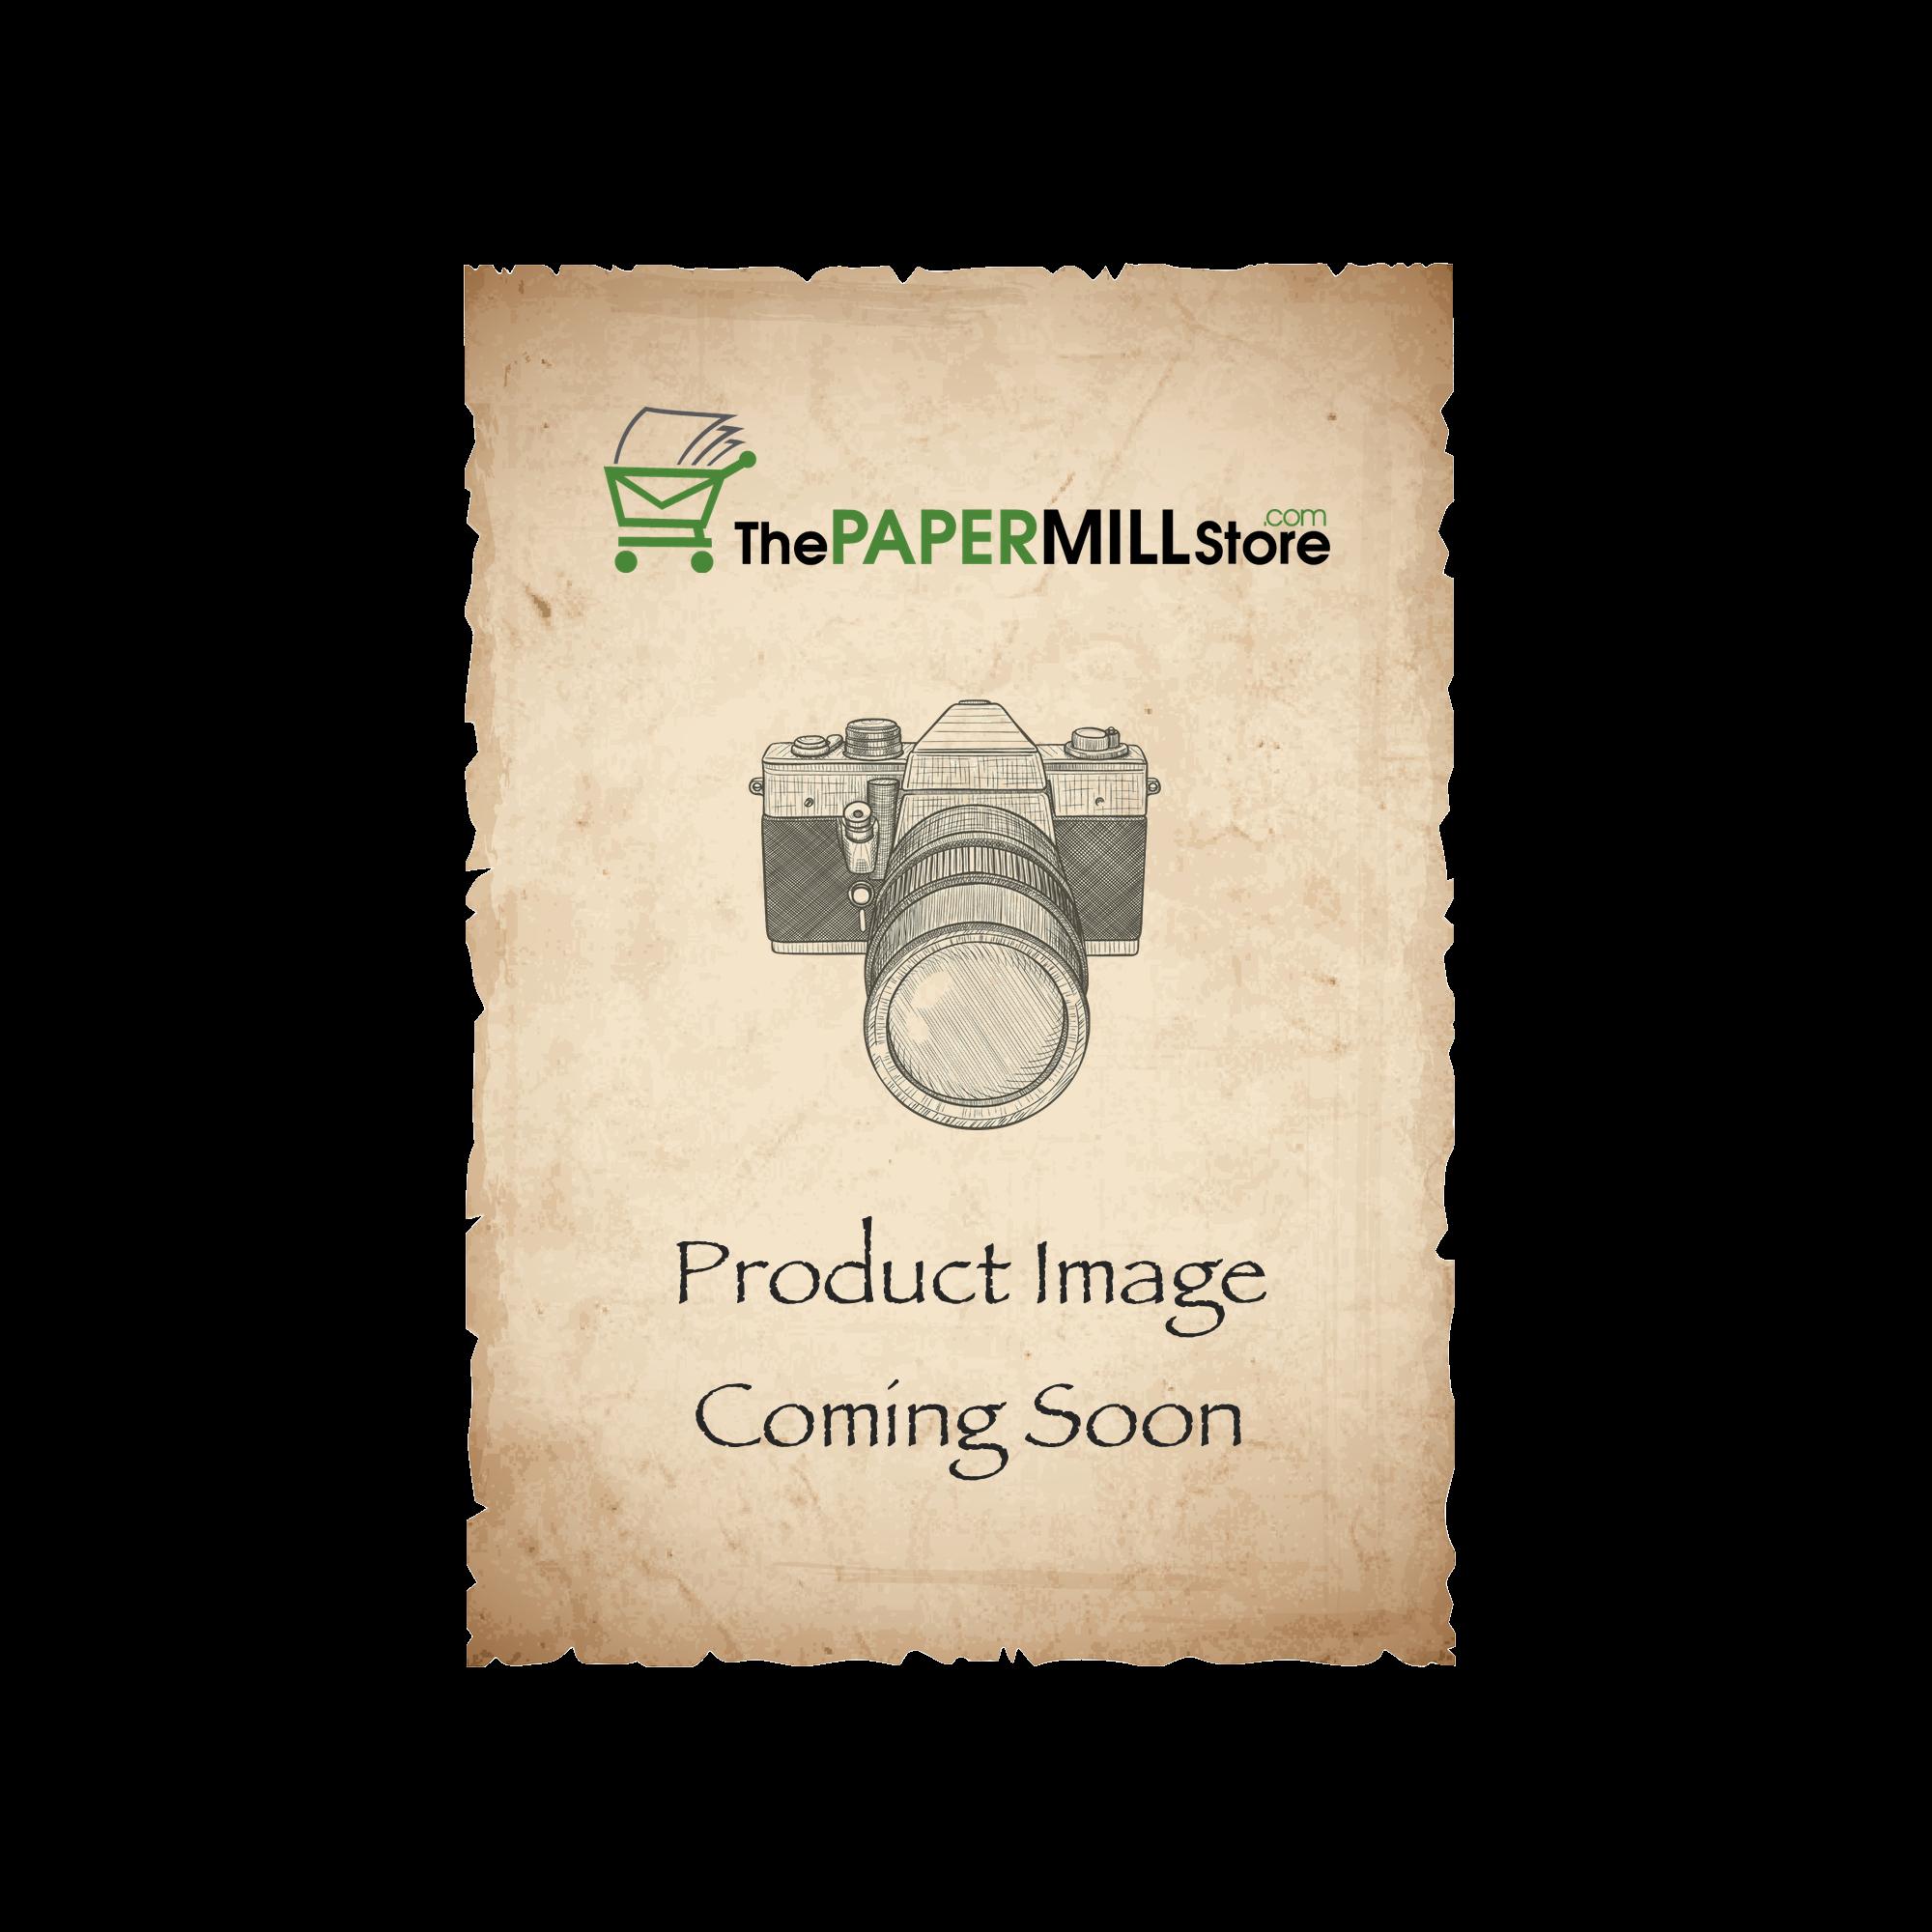 ASPIRE Petallics Beargrass Envelopes - A2 (4 3/8 x 5 3/4) 80 lb Text Linen C/2S 30% Recycled 250 per Box